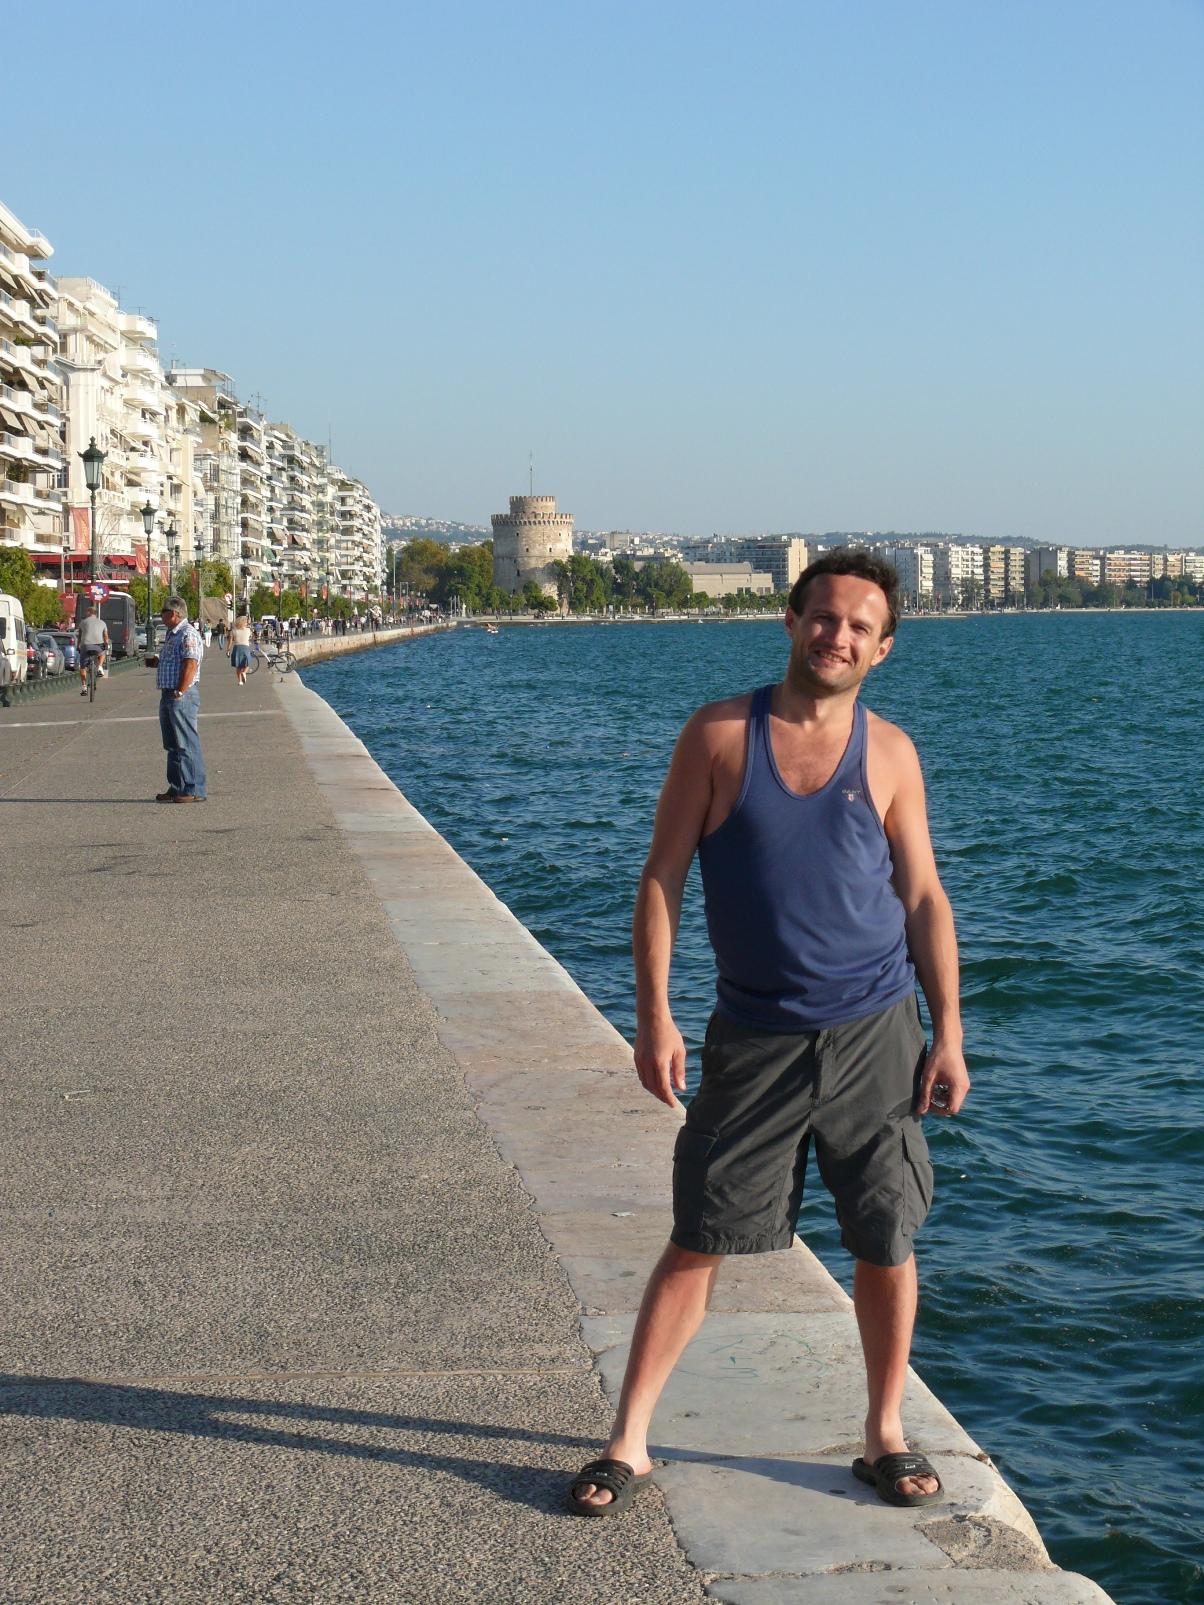 Греция, Салоники, kukmor, кукмор, Аксанов Нияз, трансерфинг, тренинг